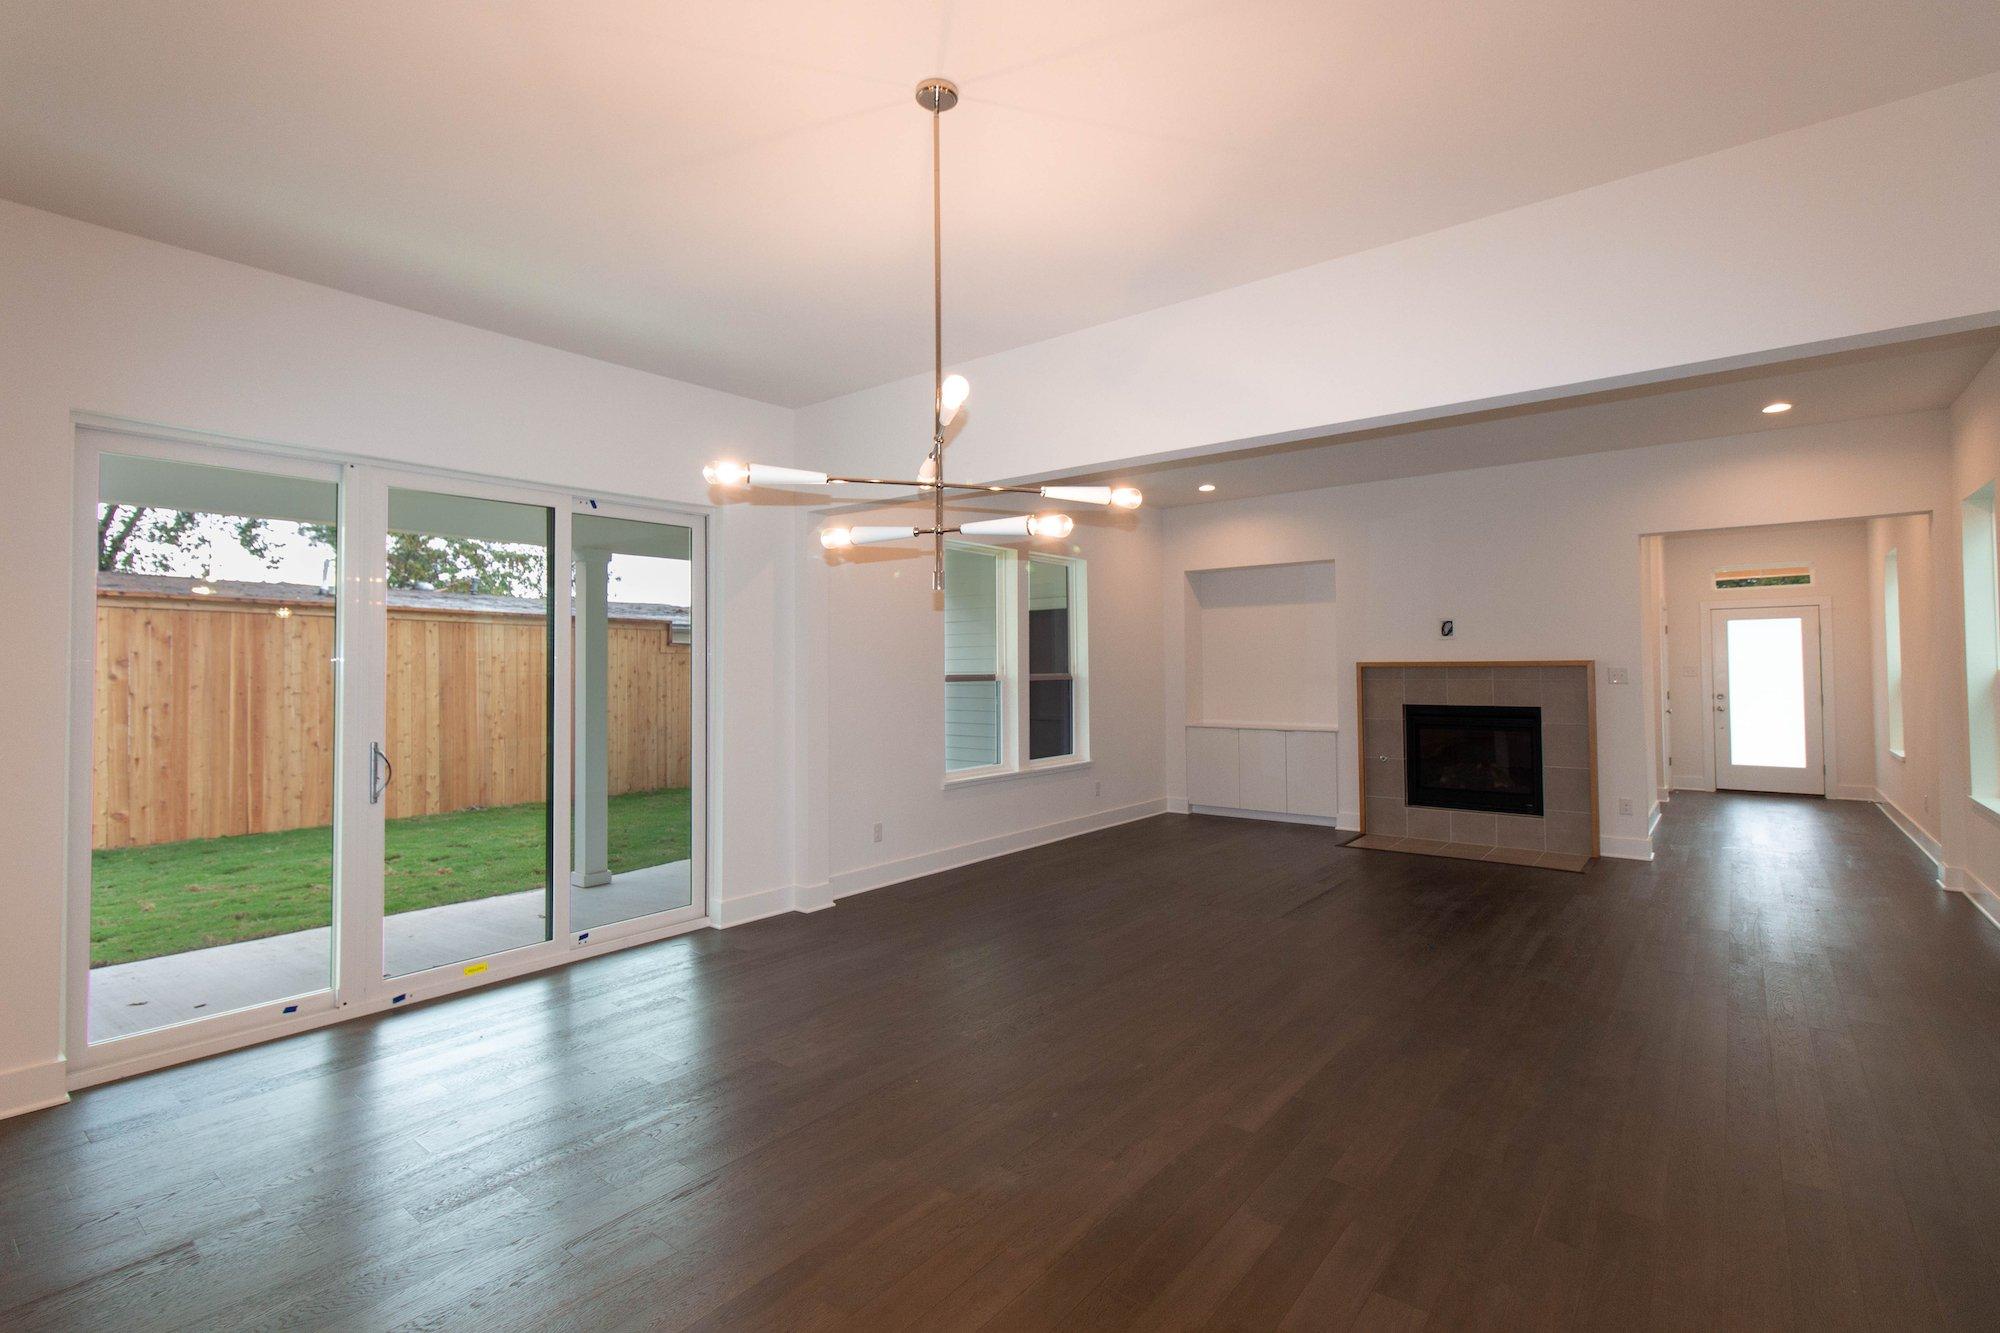 Living Room Design (Texas Homes): living room with 3-panel sliding door